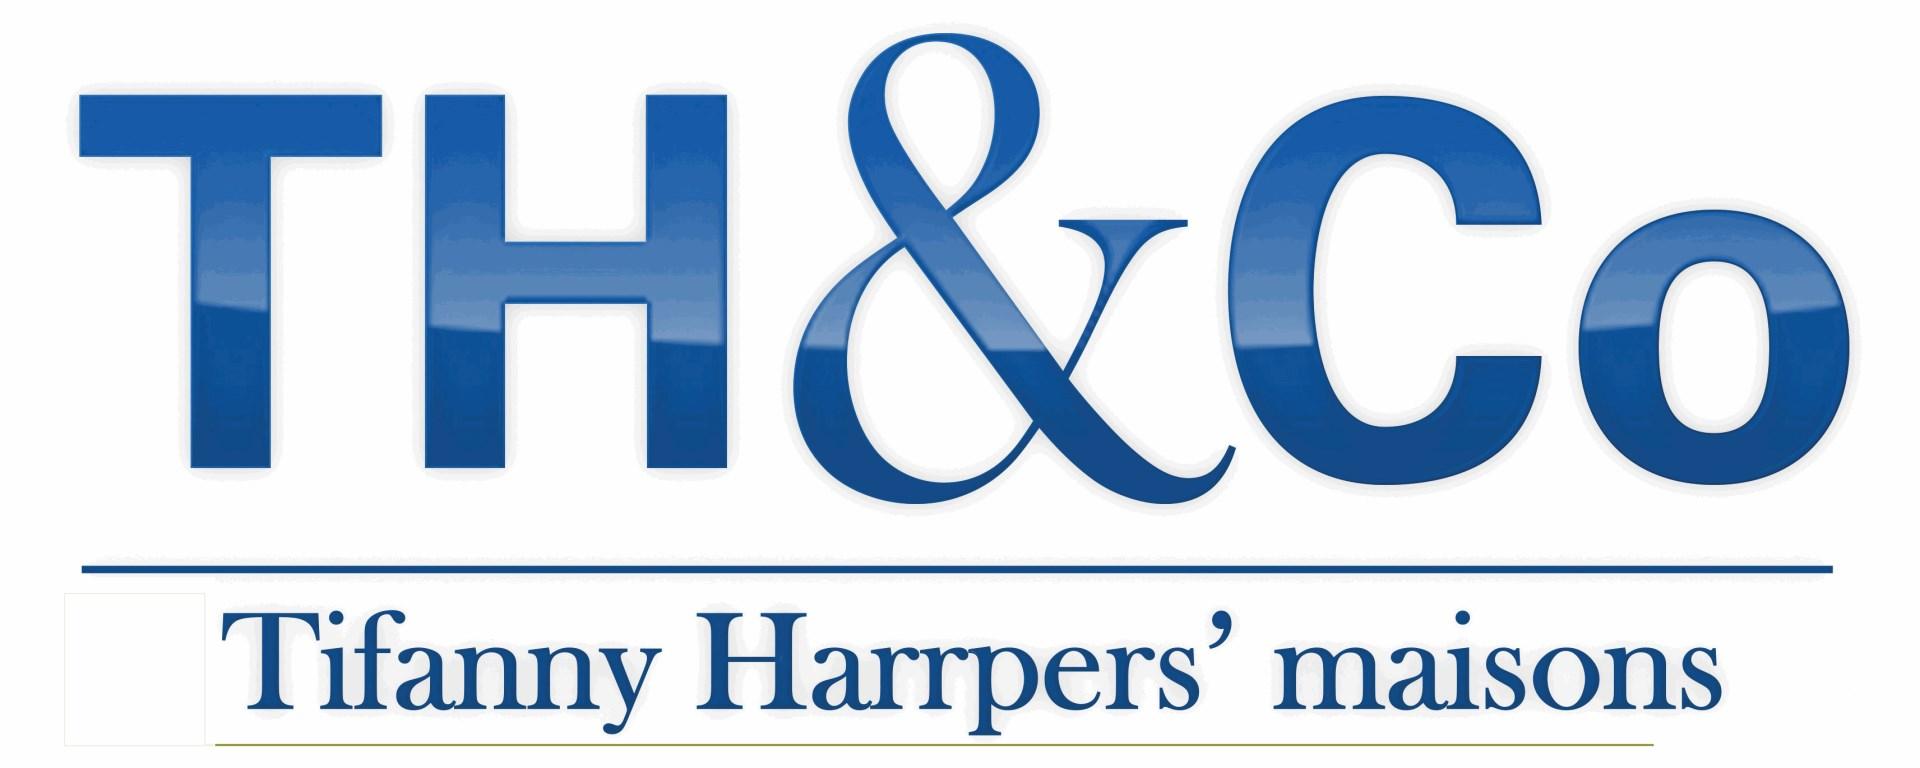 TIFANNY HARRPERS' & co